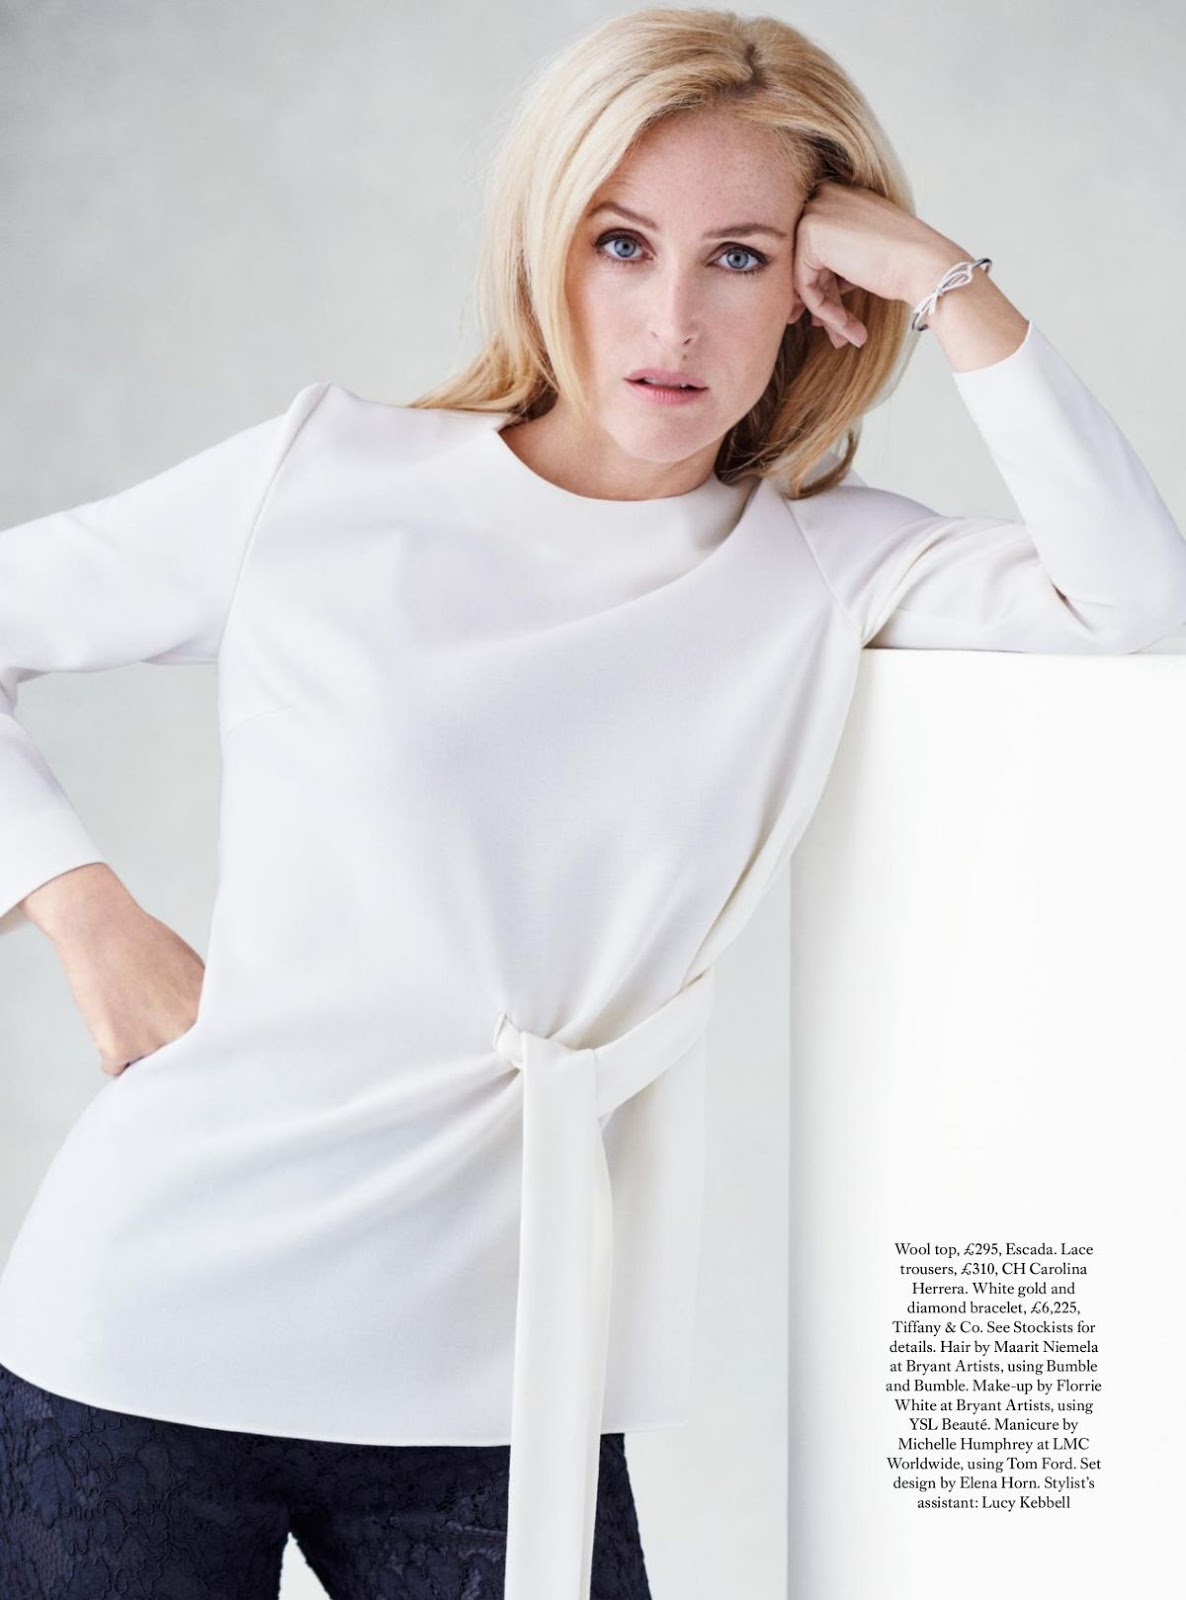 Gillian Anderson HQ Photoshoot for Harper's Bazaar Magazine UK October 2016 Issue